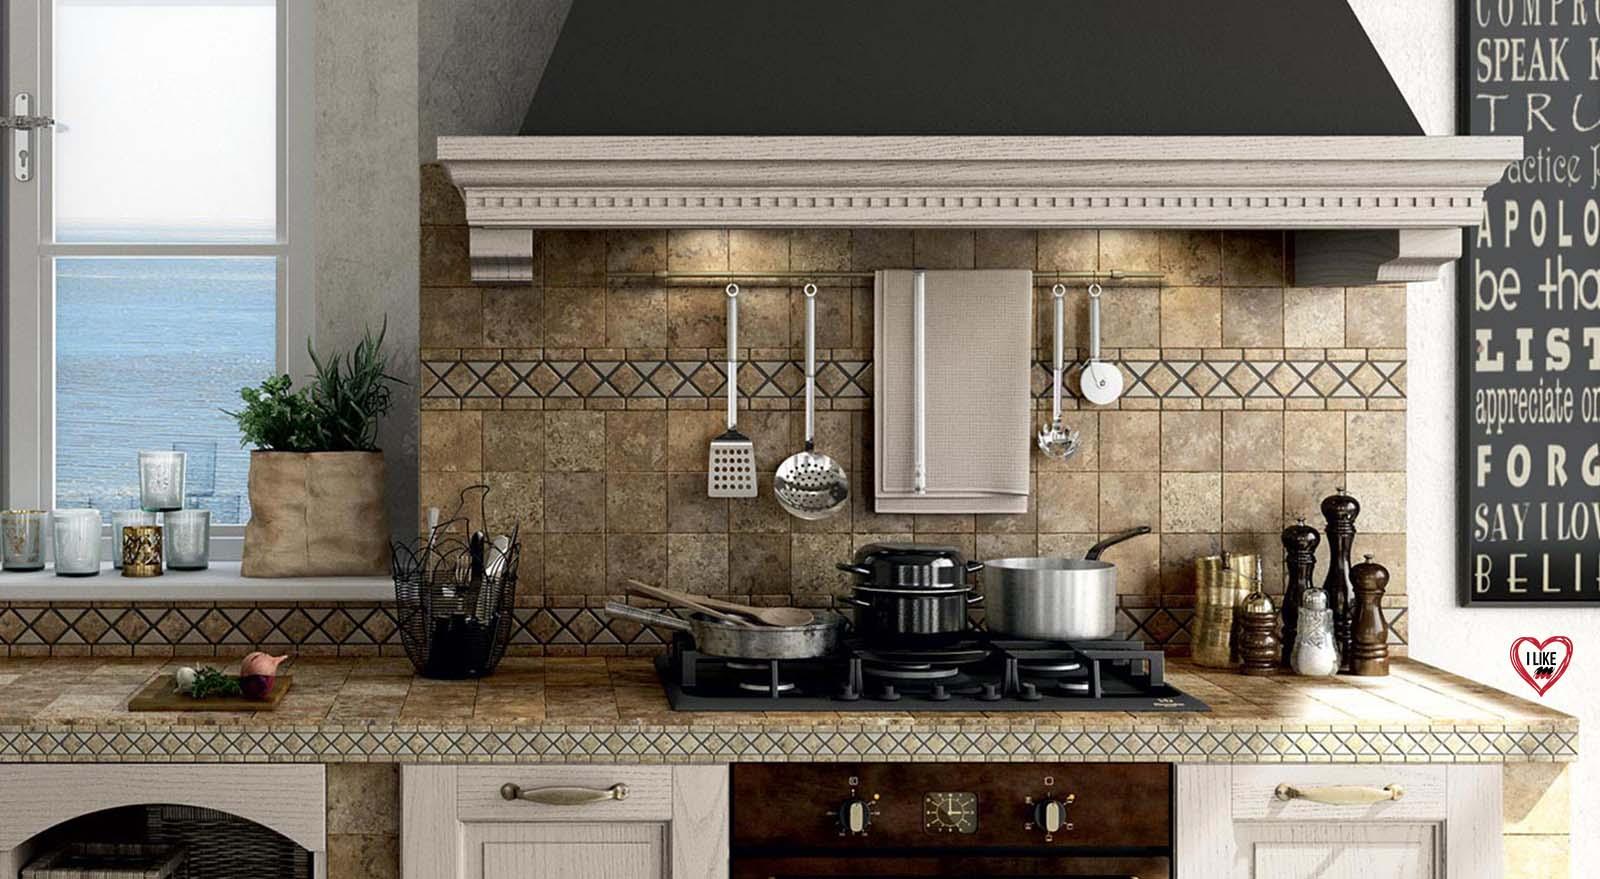 Vendita di cucine classiche in muratura a padova marchio lube for Cucine in muratura